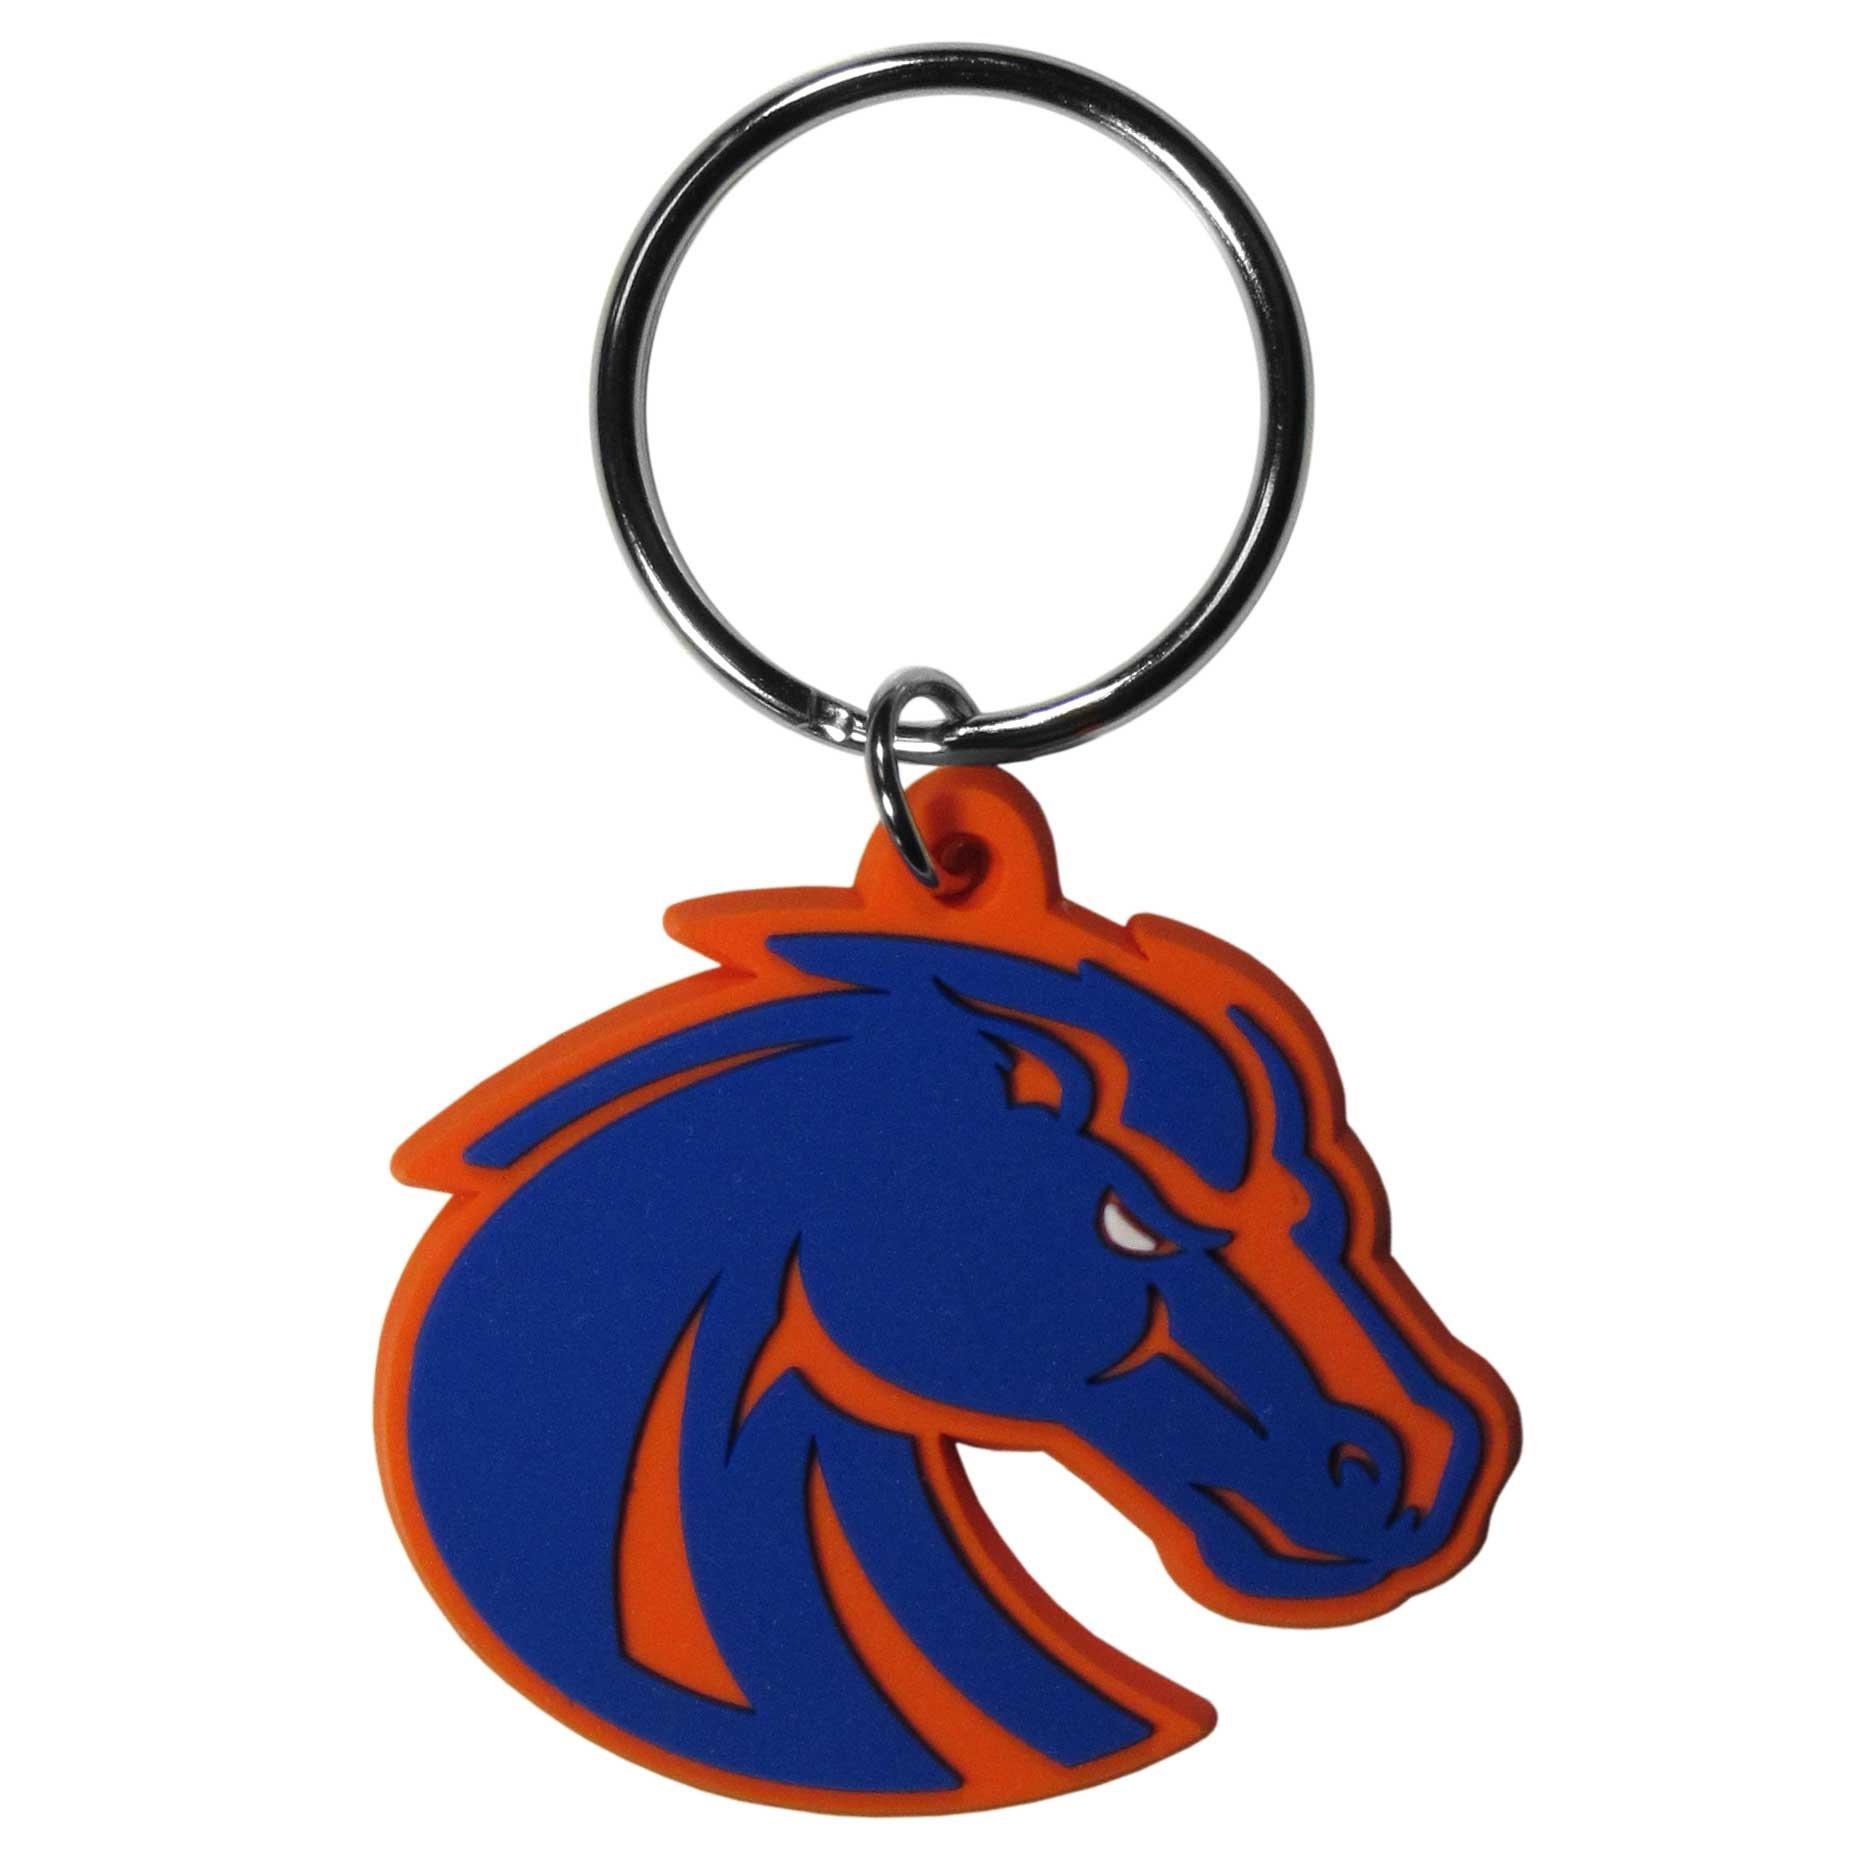 NCAA Boise State Broncos Flexi Key Chain